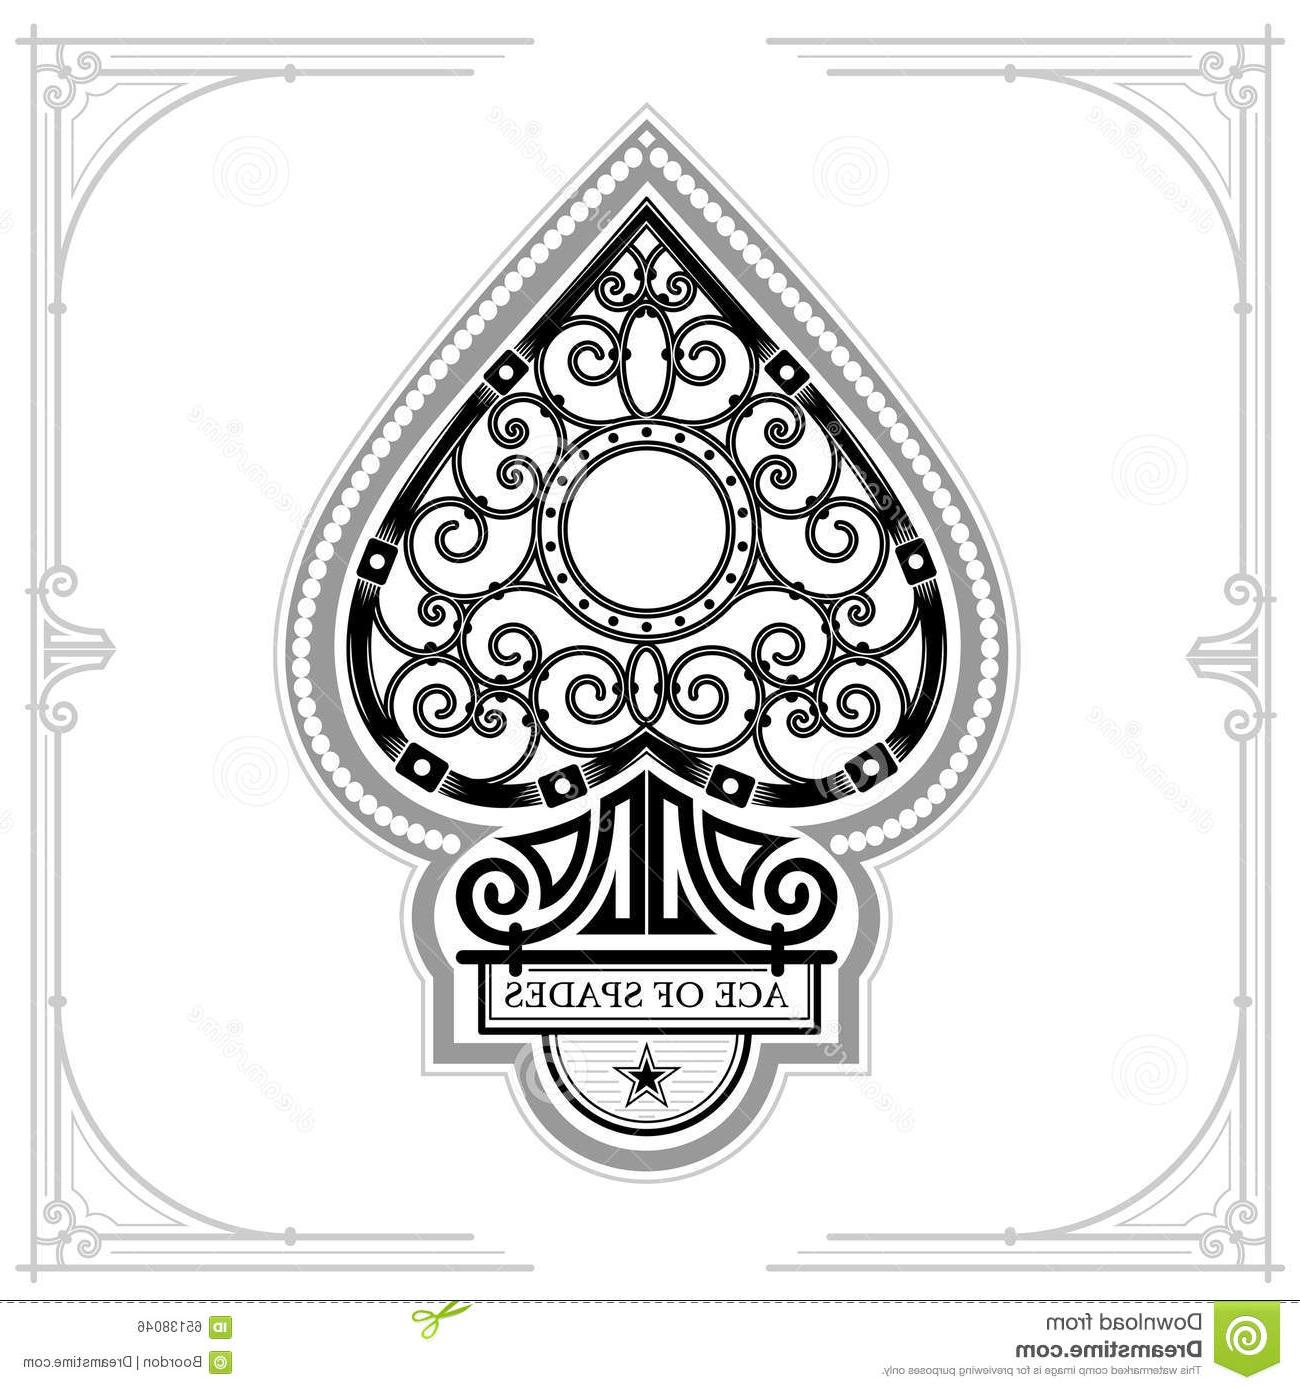 1300x1390 Best Hd Ace Spades Forging Curl Pattern Inside Black White